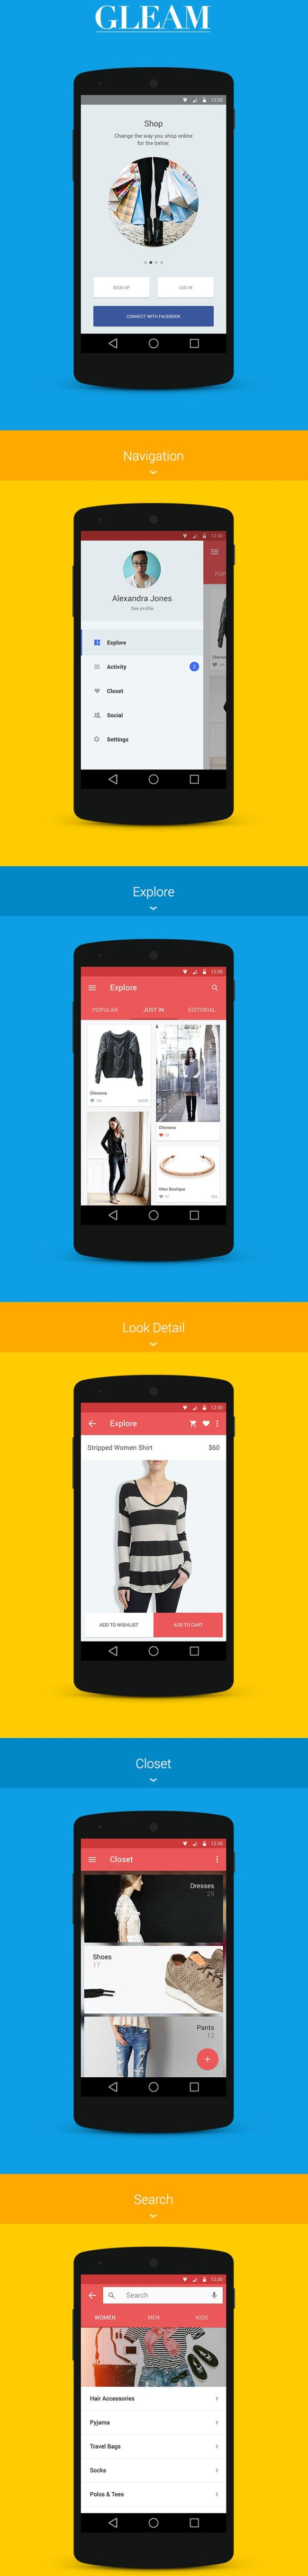 Gleam-Android